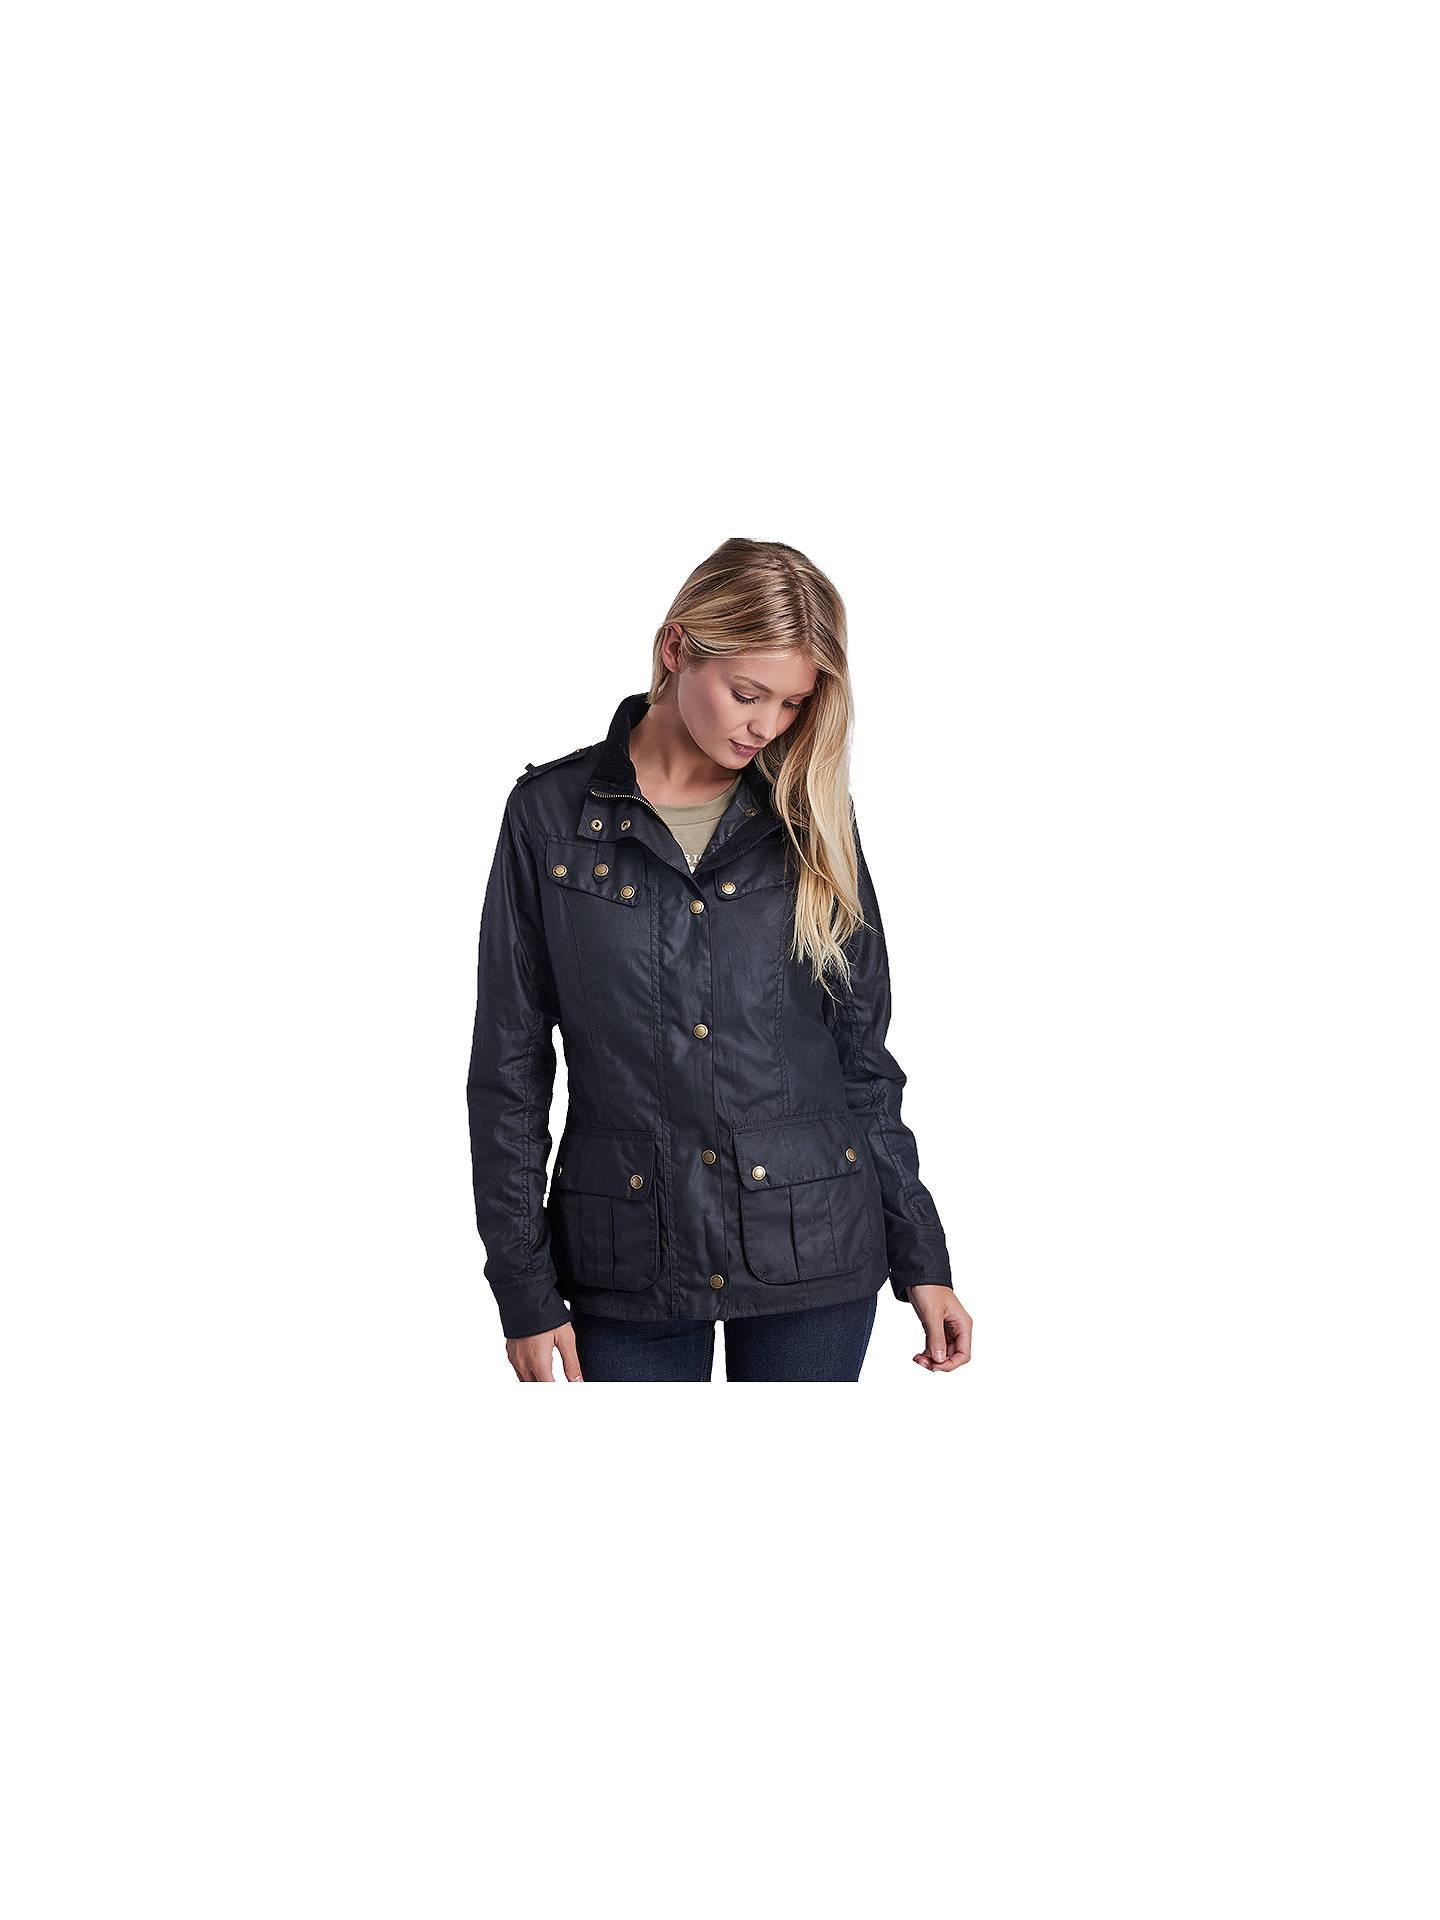 efc37153e02e7 Buy Barbour International Hairpin Waxed Jacket, Black, 10 Online at  johnlewis.com ...